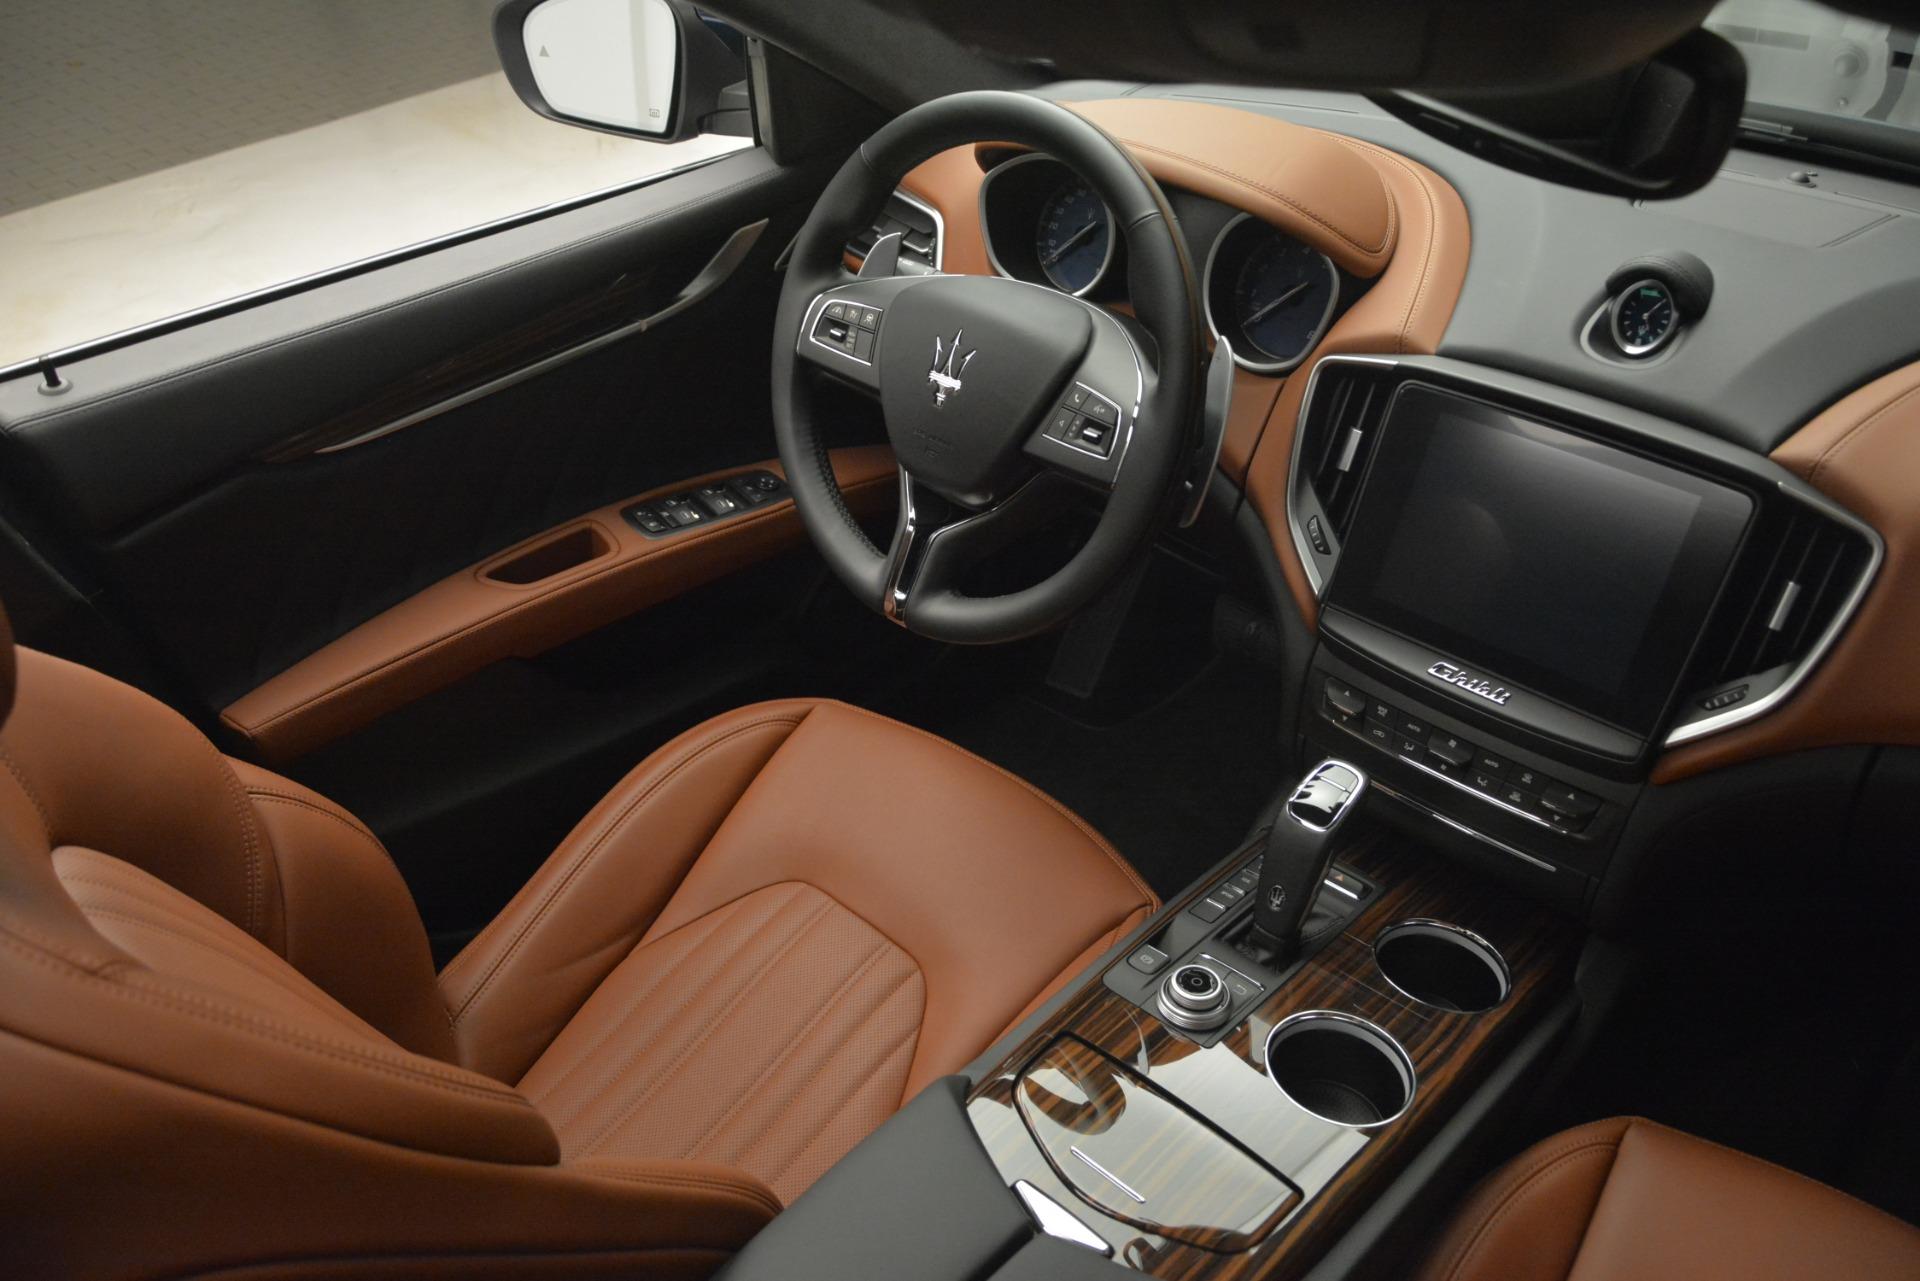 New 2019 Maserati Ghibli S Q4 GranLusso